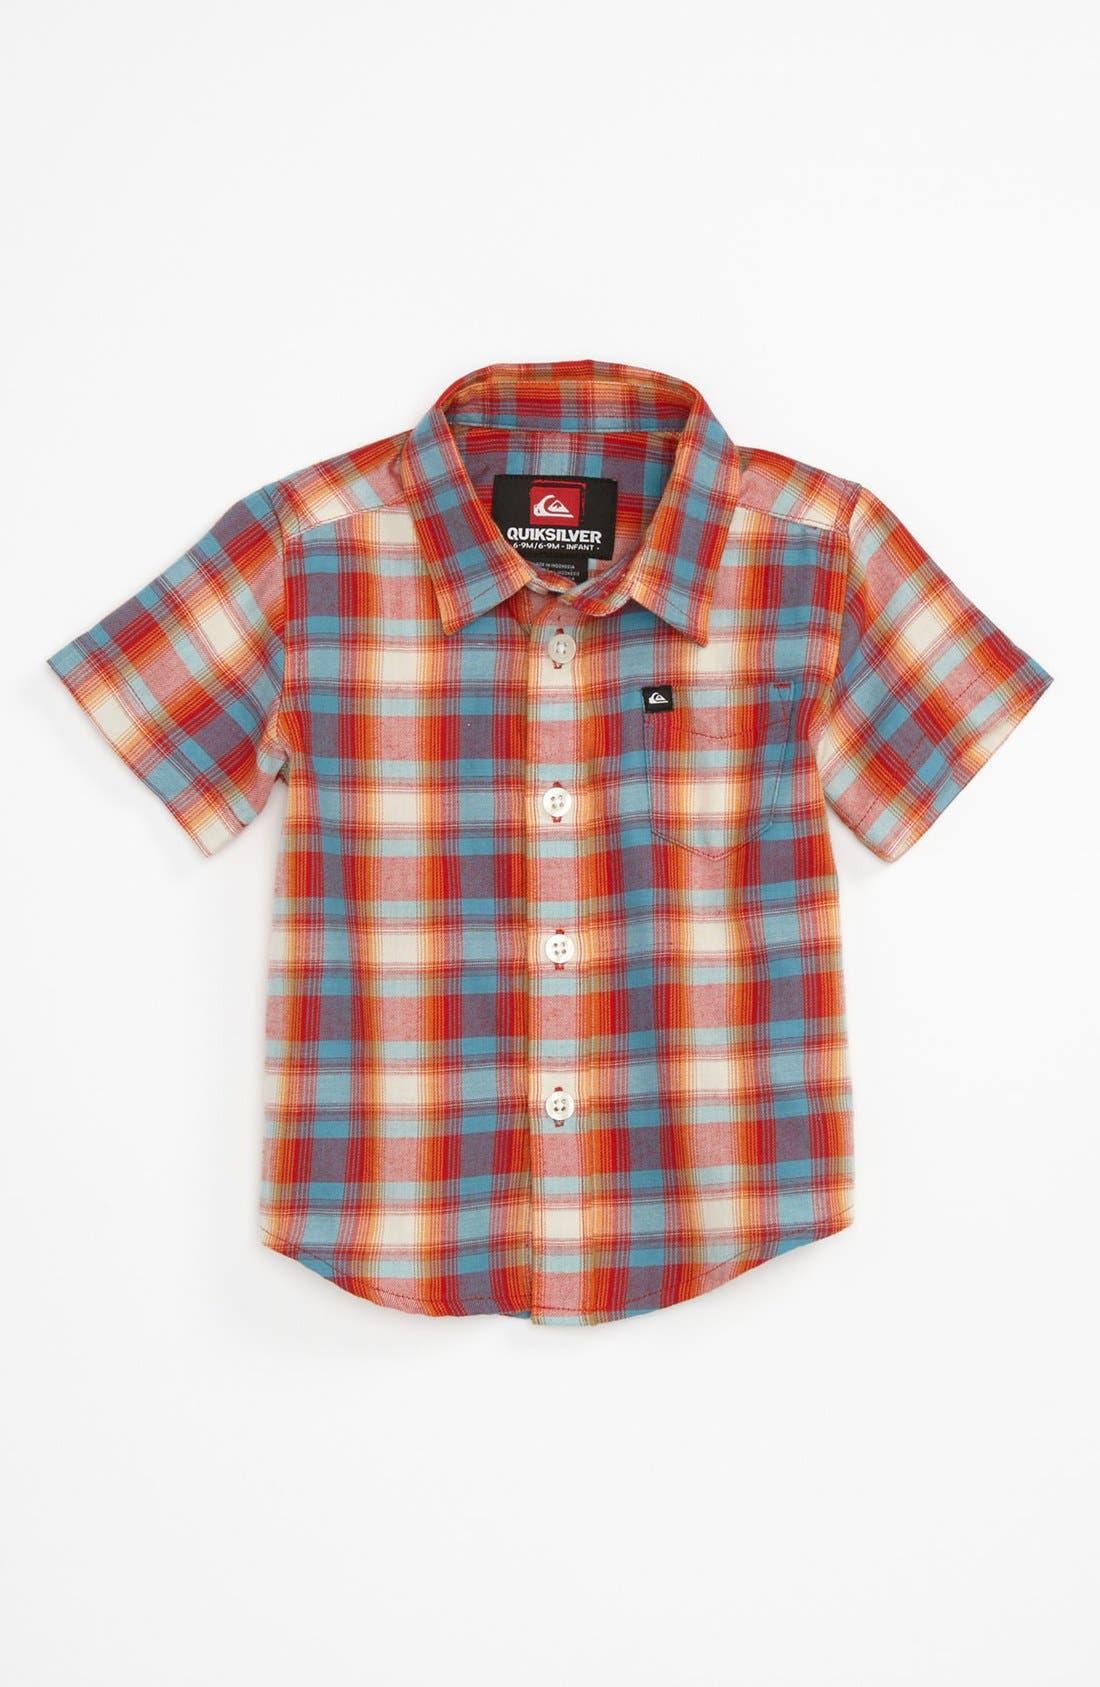 Main Image - Quiksilver 'Flash Surf' Woven Shirt (Baby)